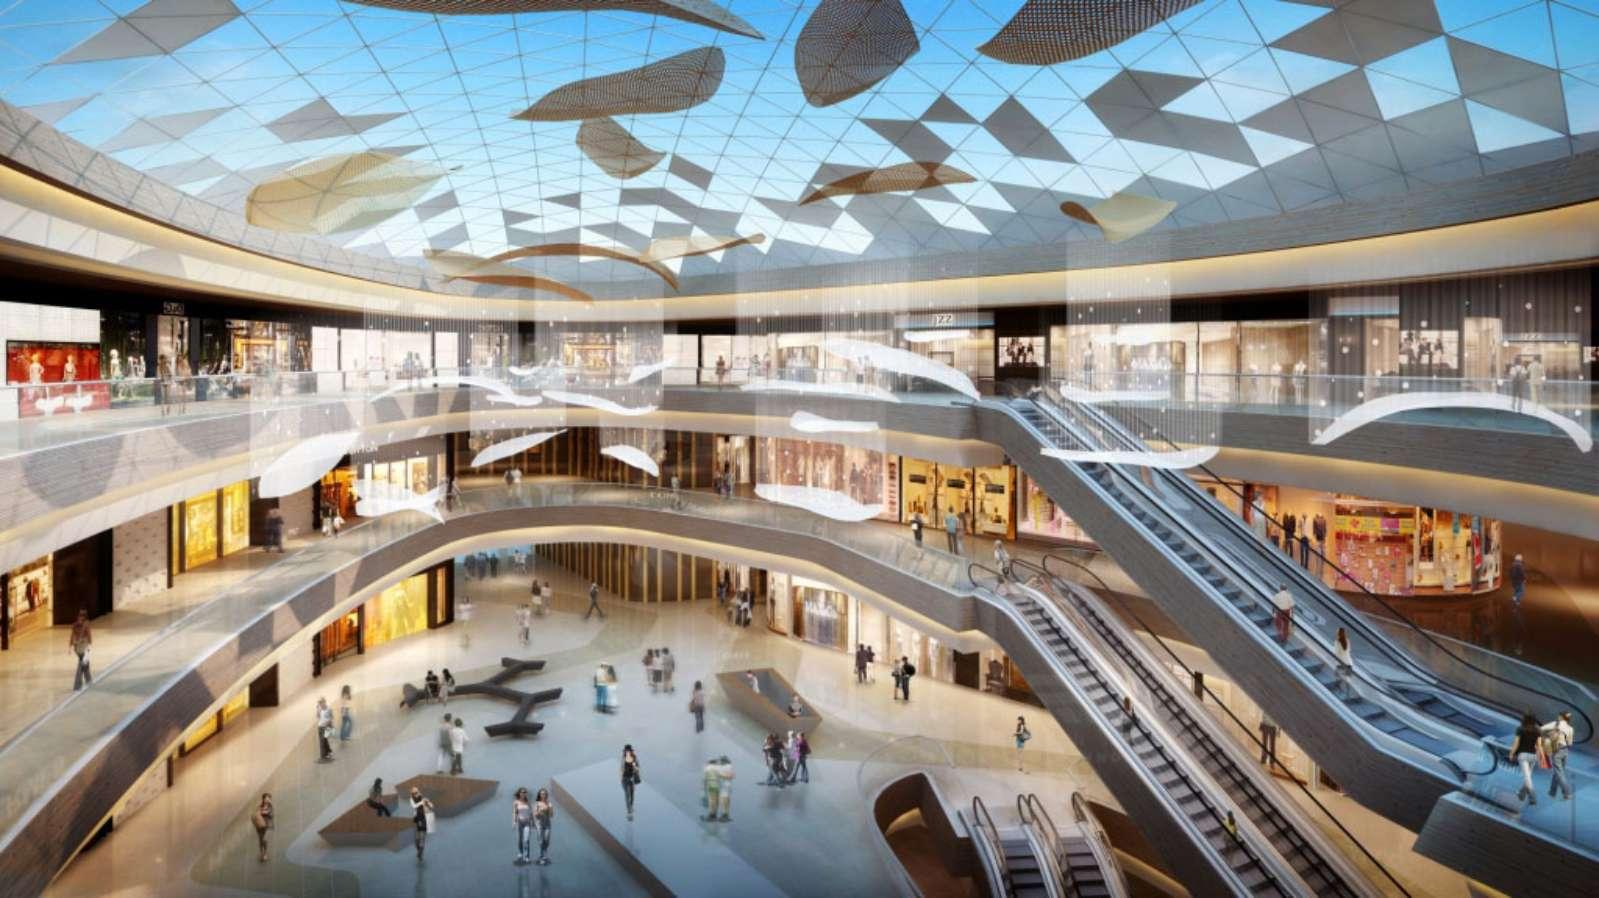 Hating Bay International Shopping Center